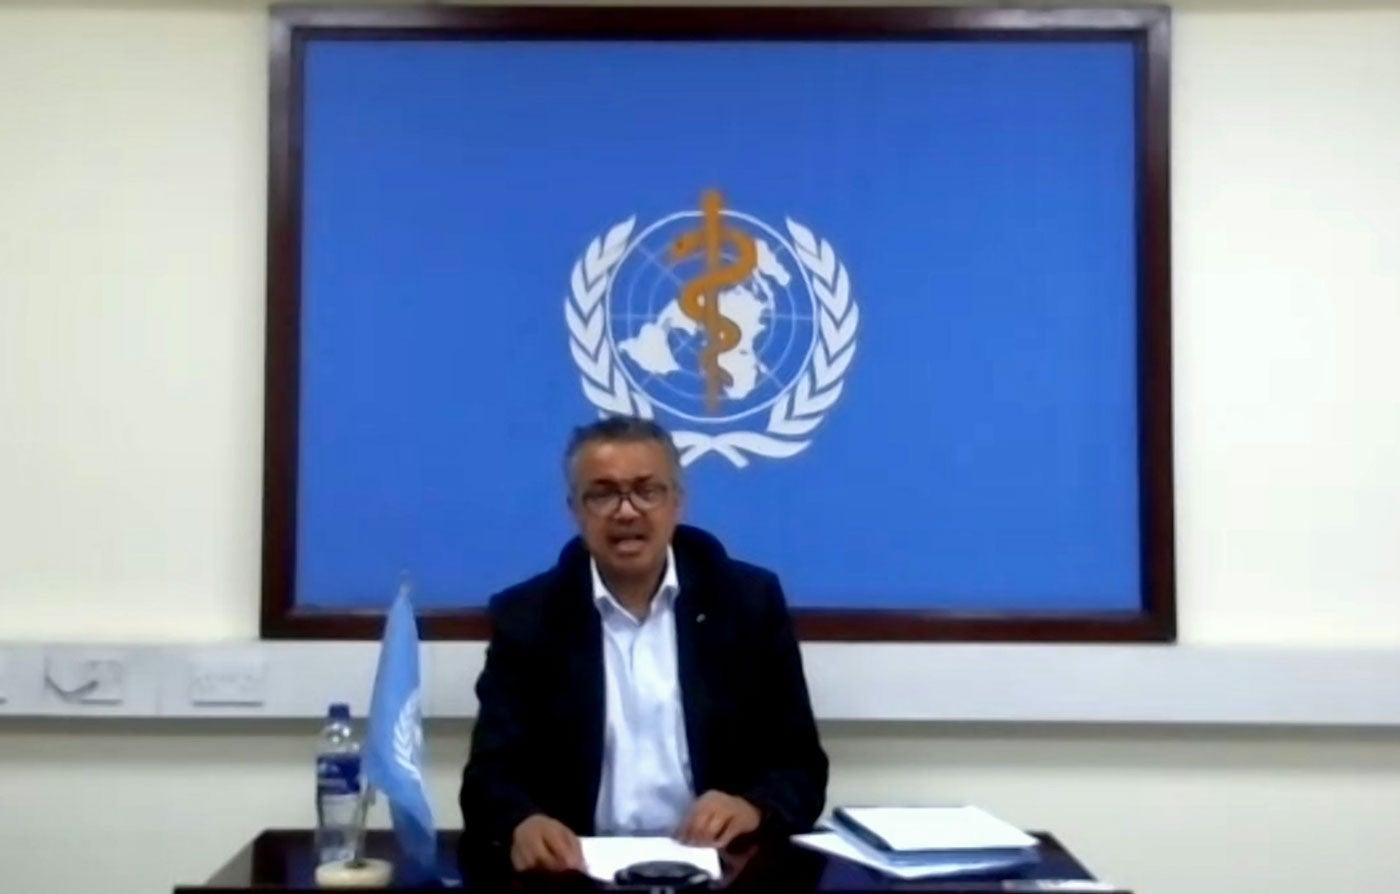 Director General of the World Health Organization (WHO), Tedros Adhanom Ghebreyesus